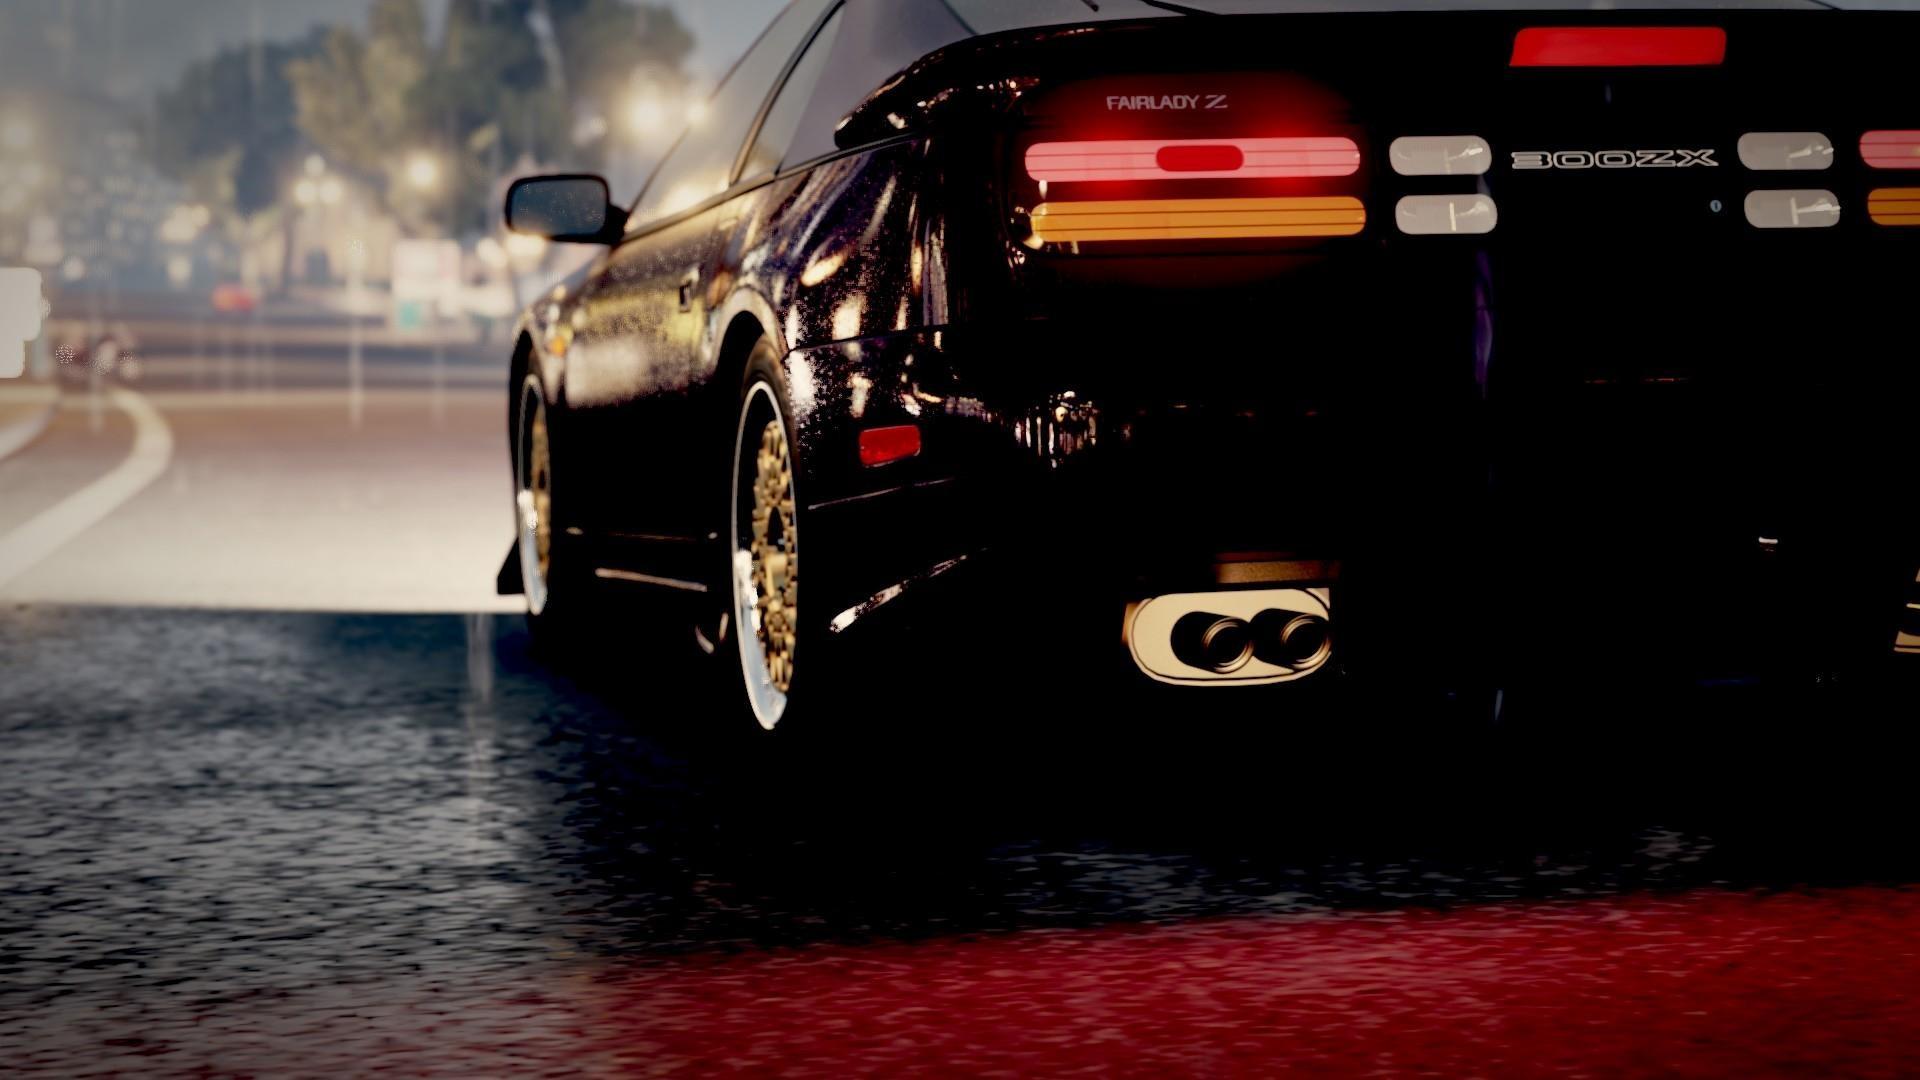 wallpaper.wiki-Free-Download-Nissan-300zx-Wallpaper-PIC-